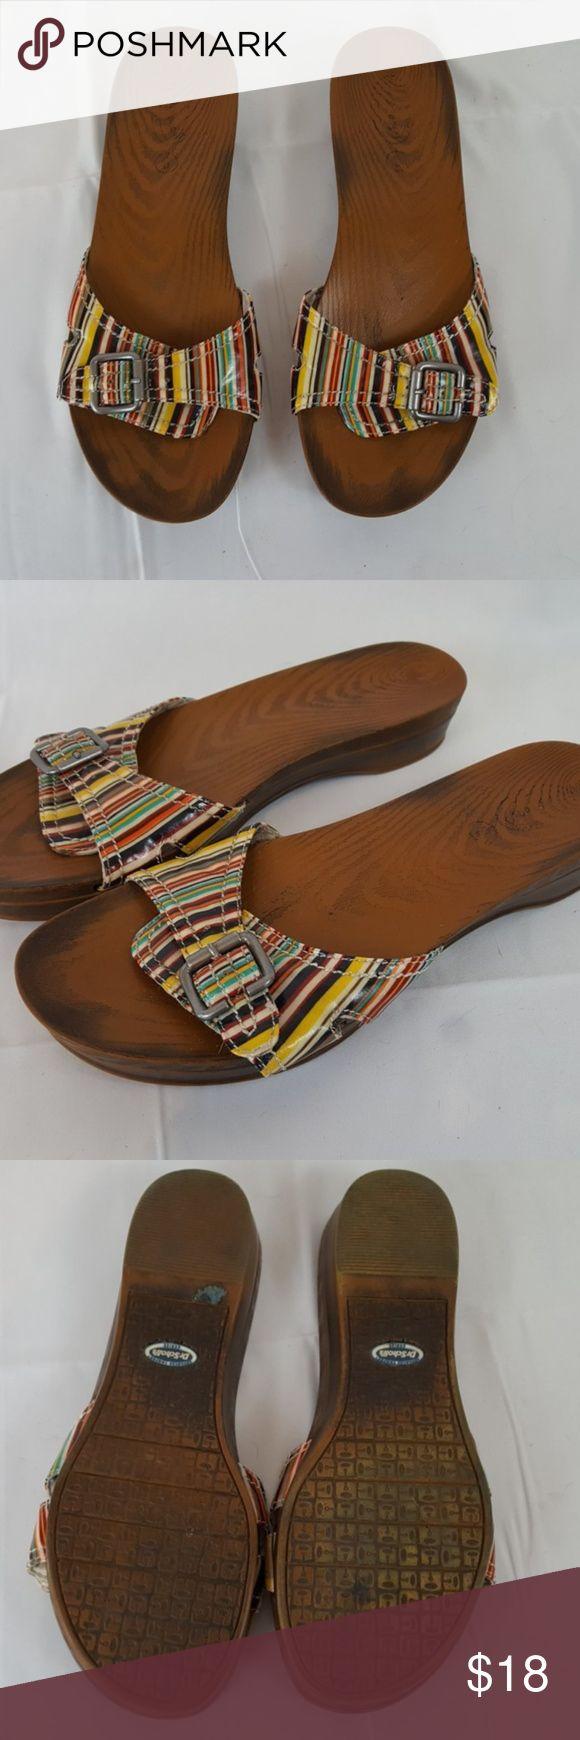 Striped Dr Scholl's Retro Sandals Cute Dr. Scholls sandals. Good condtiion Dr. Scholl's Shoes Sandals